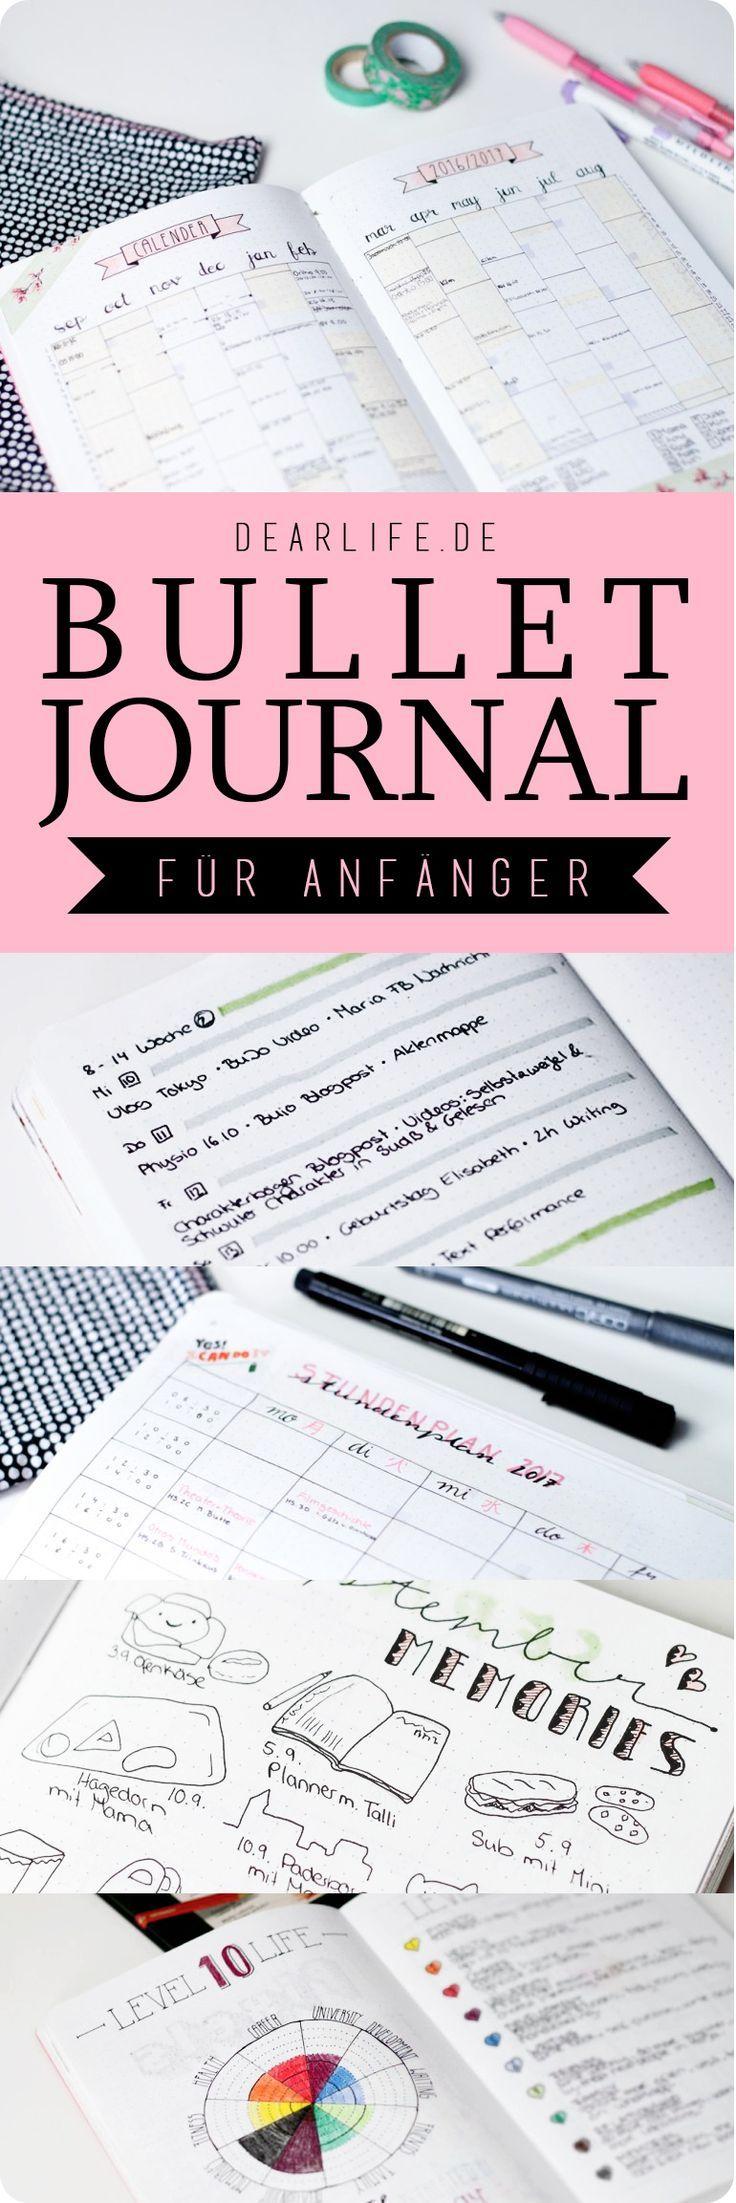 217 best Bullet Journal / Filofax images on Pinterest   Journals ...